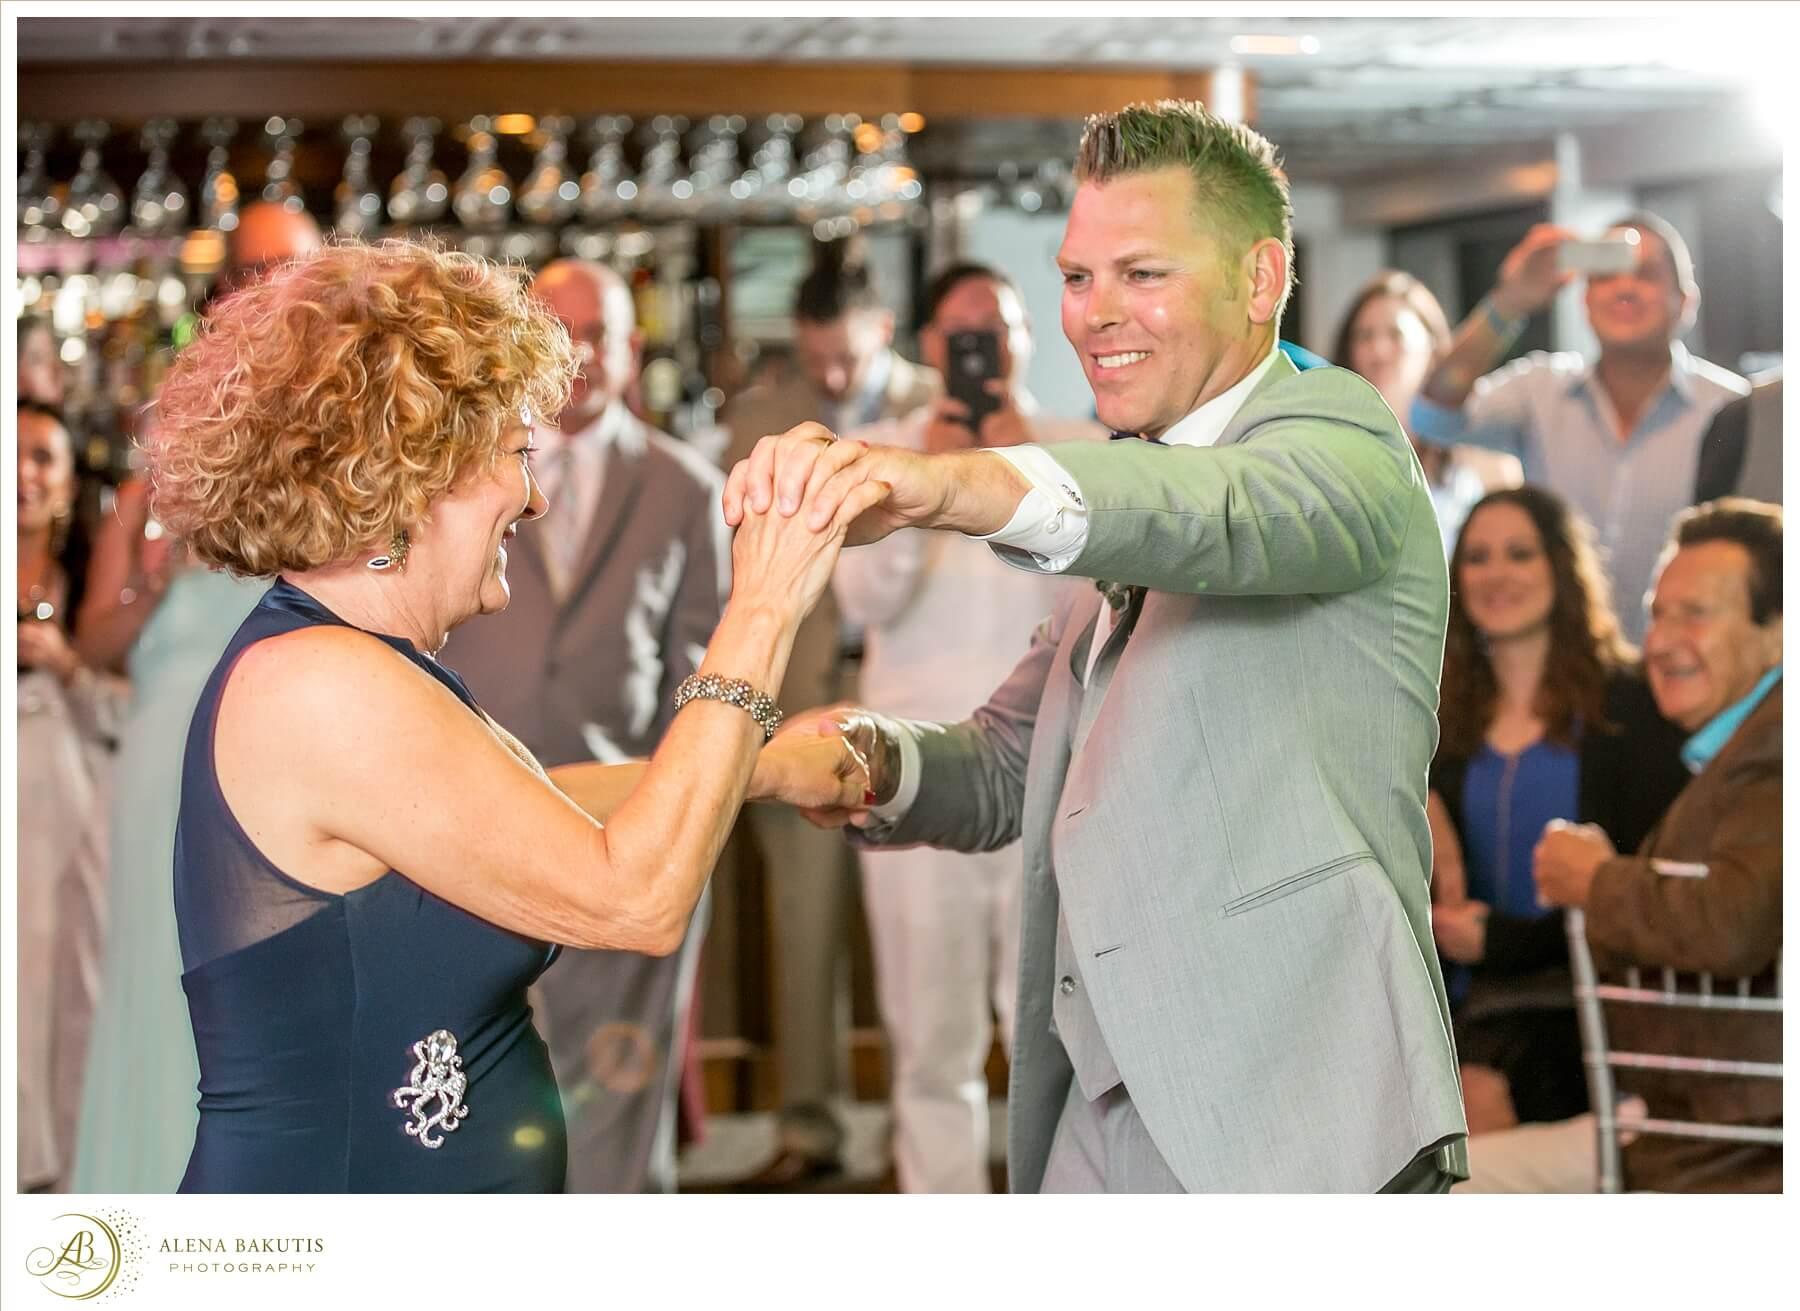 destin wedding venues Alena Bakutis Photography - Amber Brandon-728_WEB